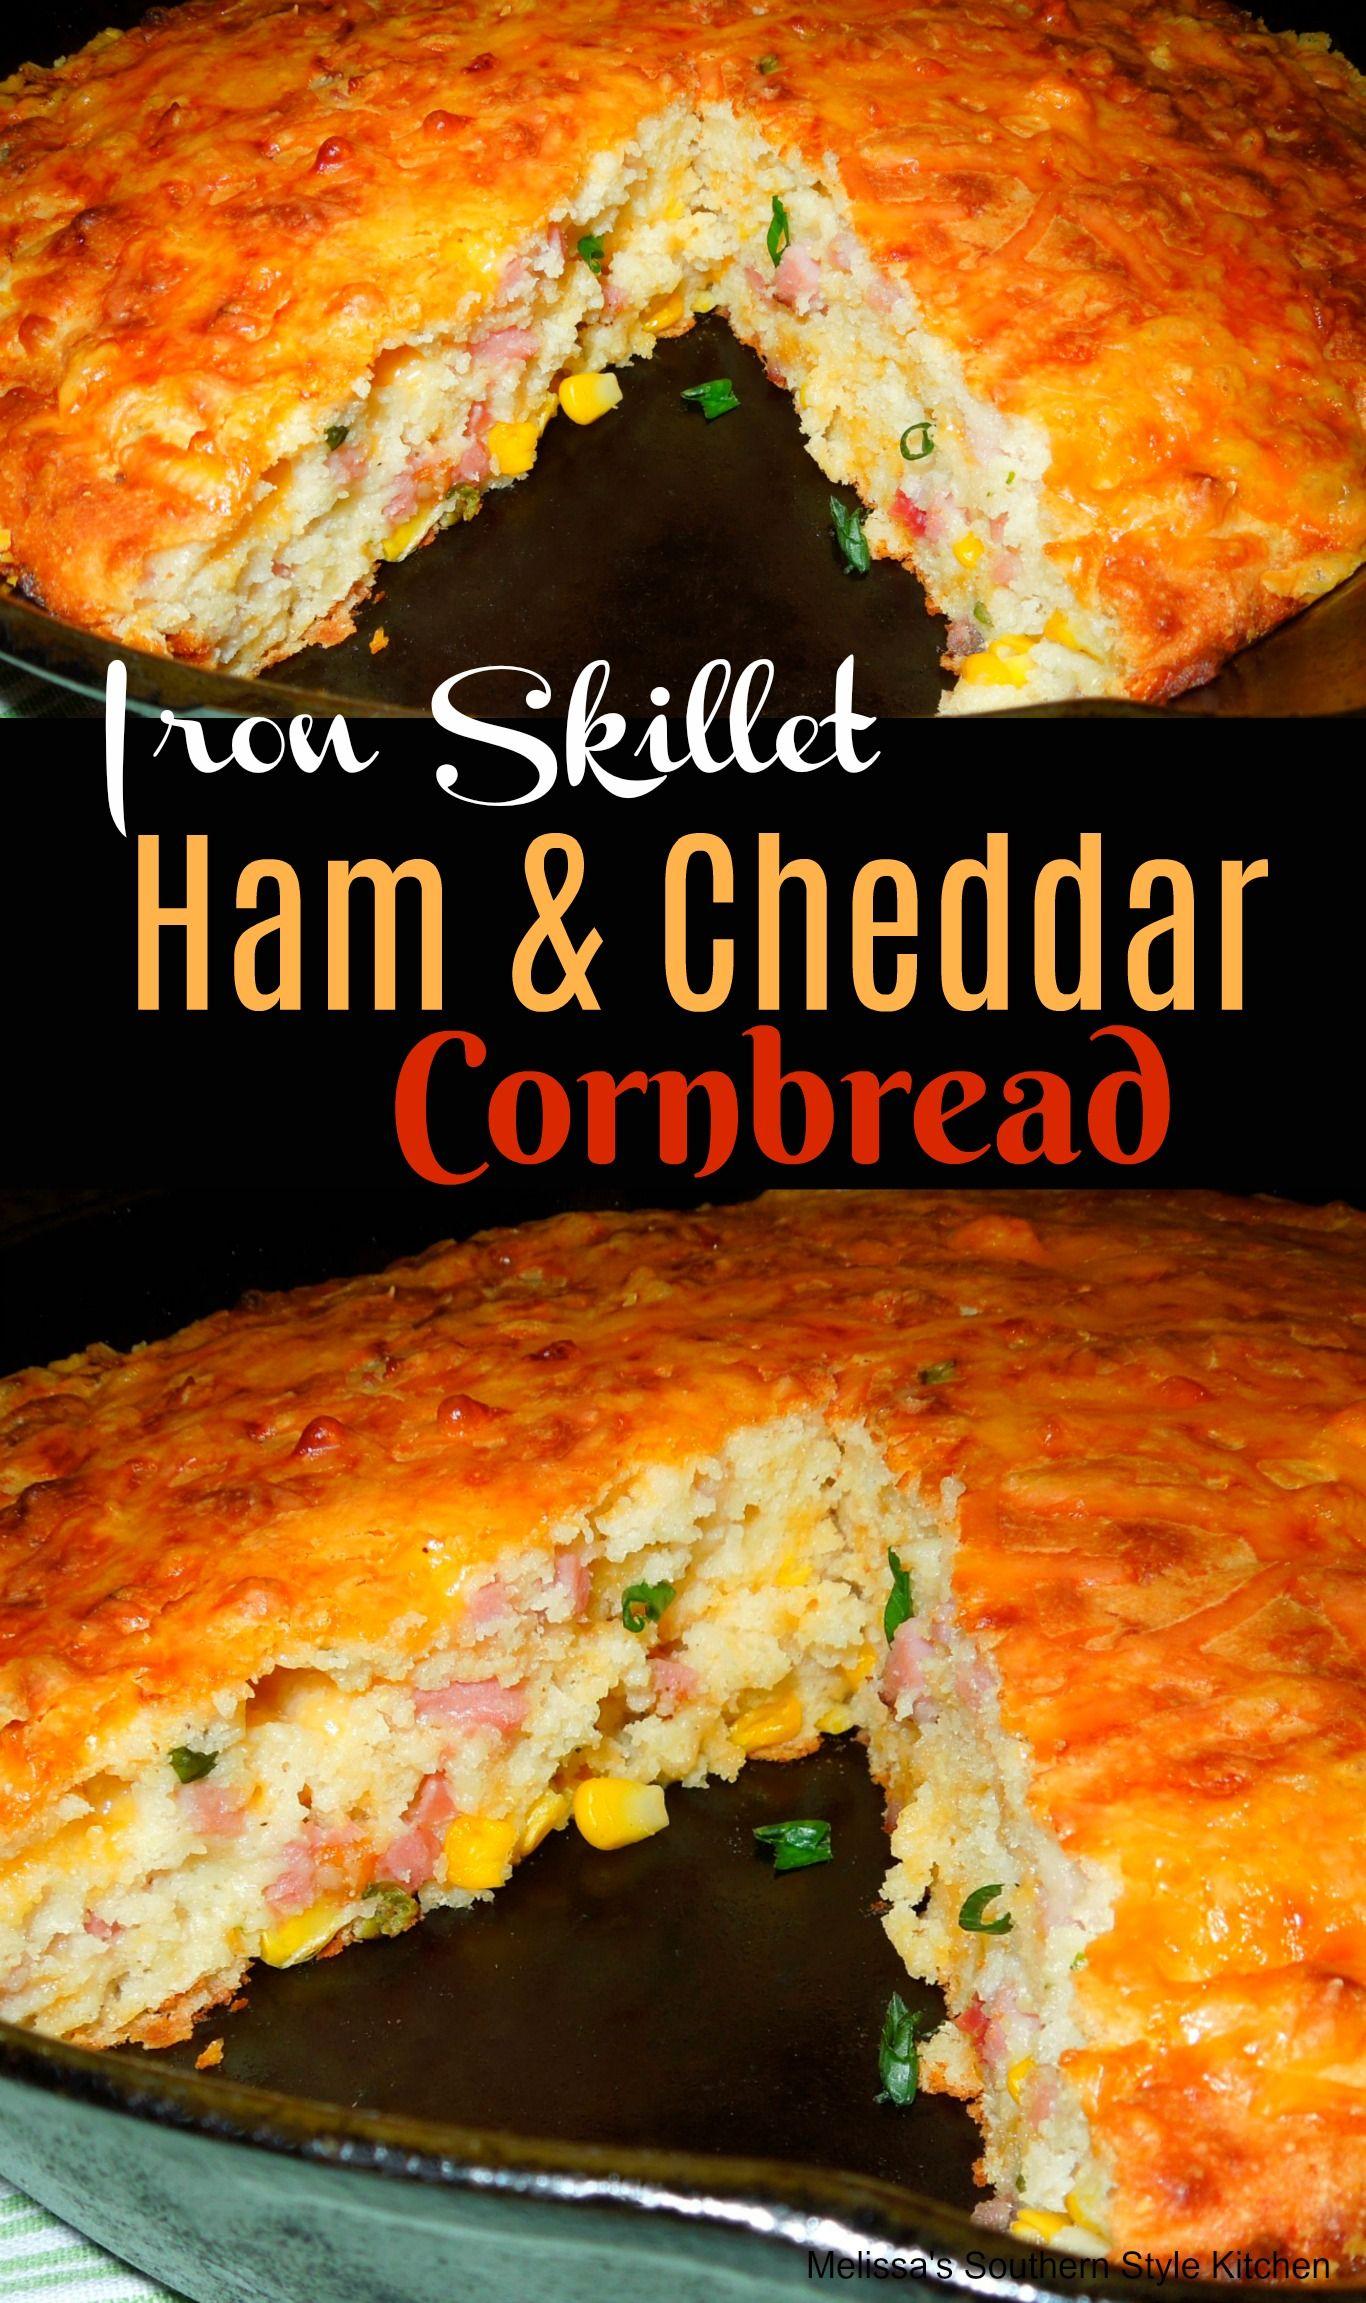 Iron Skillet Ham And Cheddar Cornbread #recipes #ham #cornbread #castironcooking #Southern #baking #foodie #cheddar #hamandcheese #leftoverham #skilletmeals #bread #mexicancornbreadcasserole